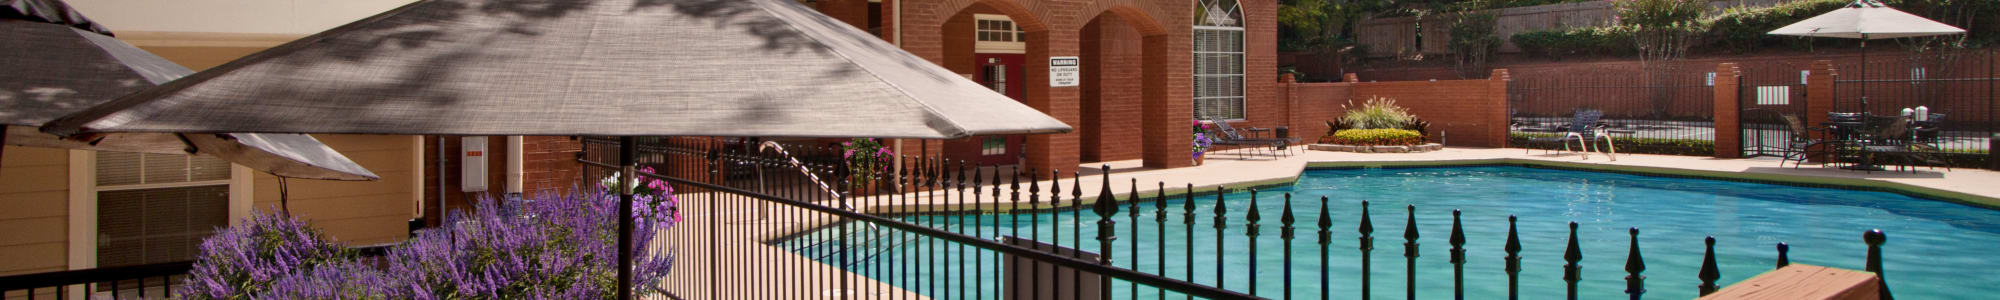 Swimming pool at Brookwood Valley